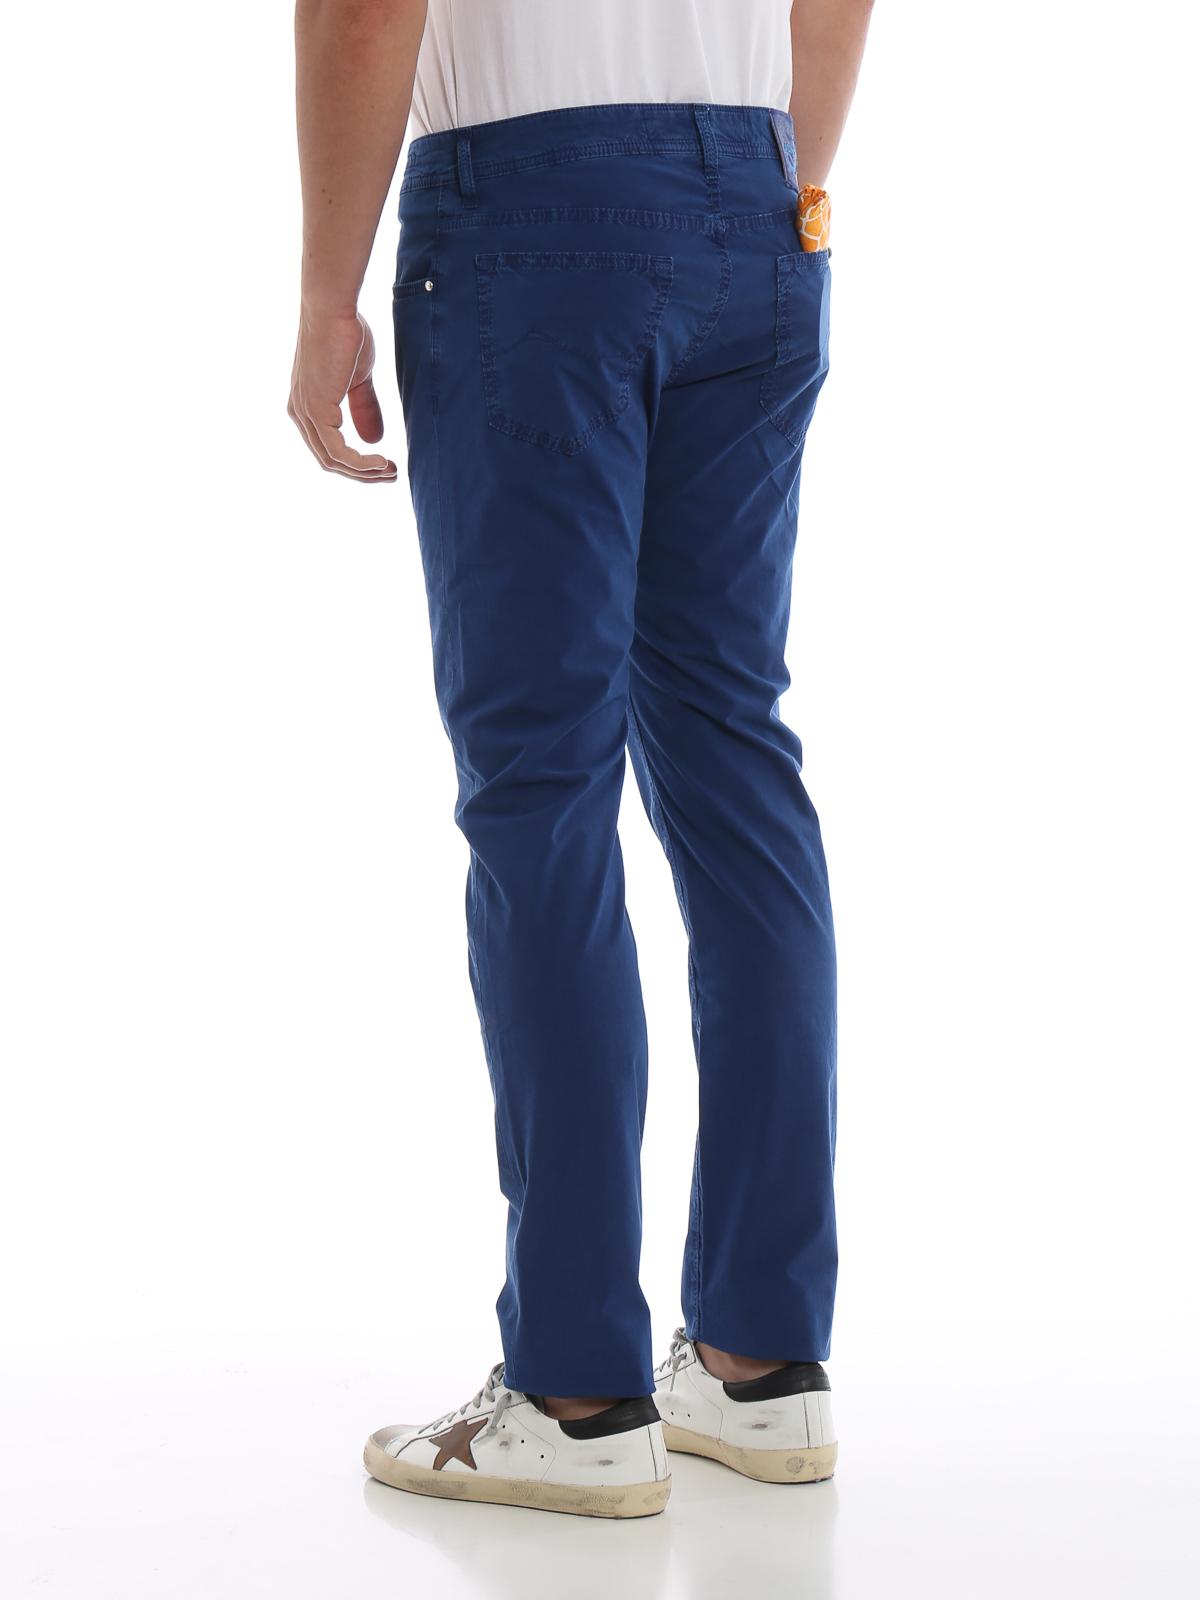 pantalone uomo slim cotone stretch tinto capo fashion moda MADE ITALY prezzo blu